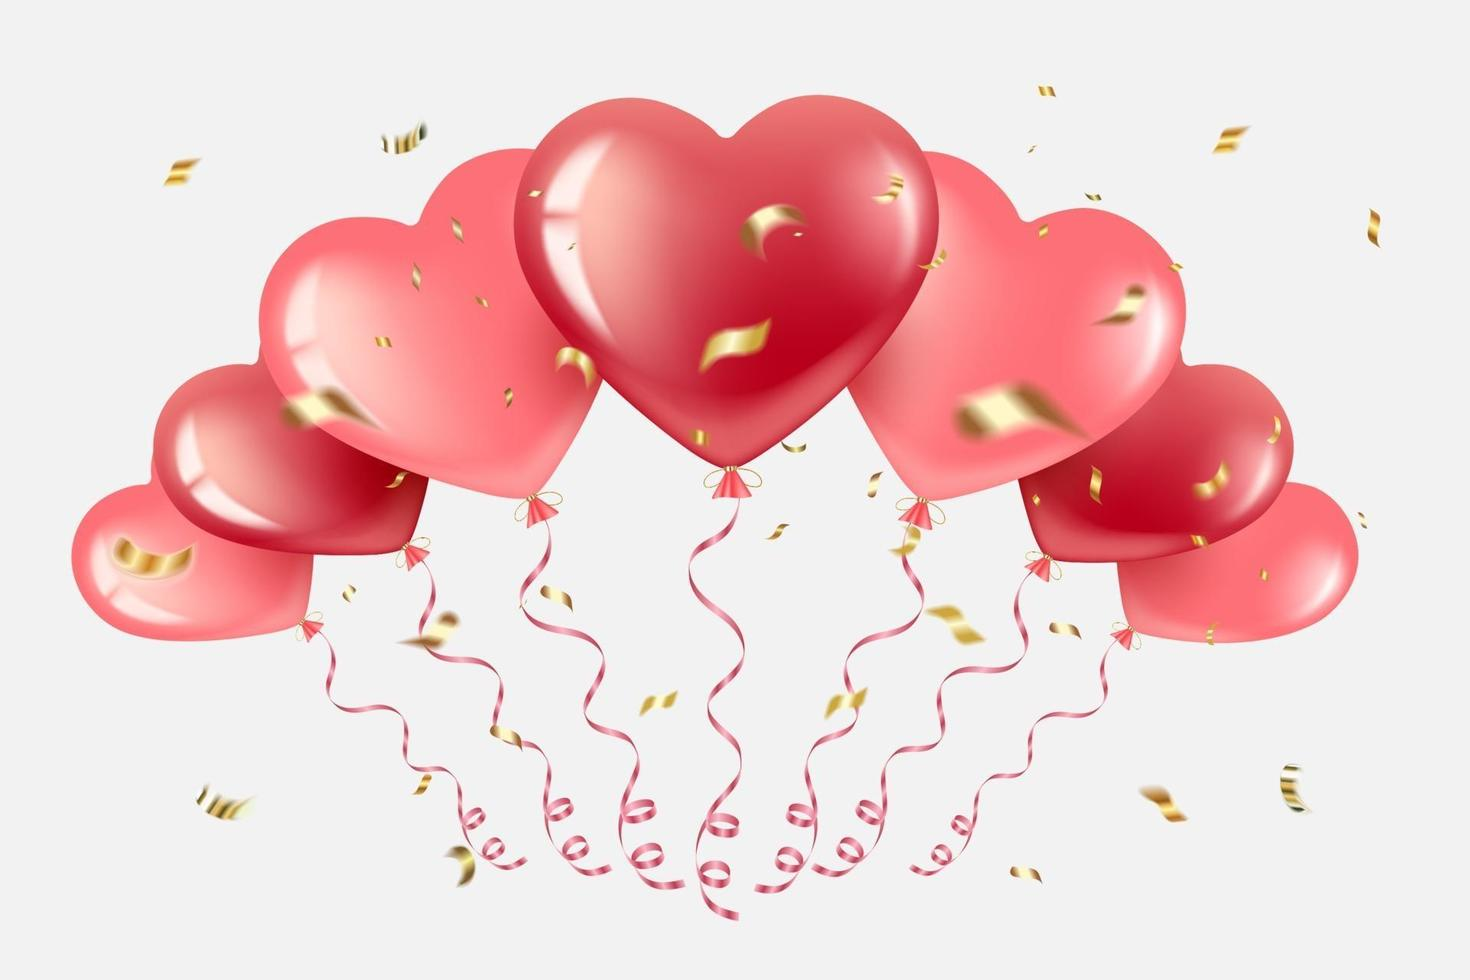 hjärta ballonger med gyllene konfetti vektor